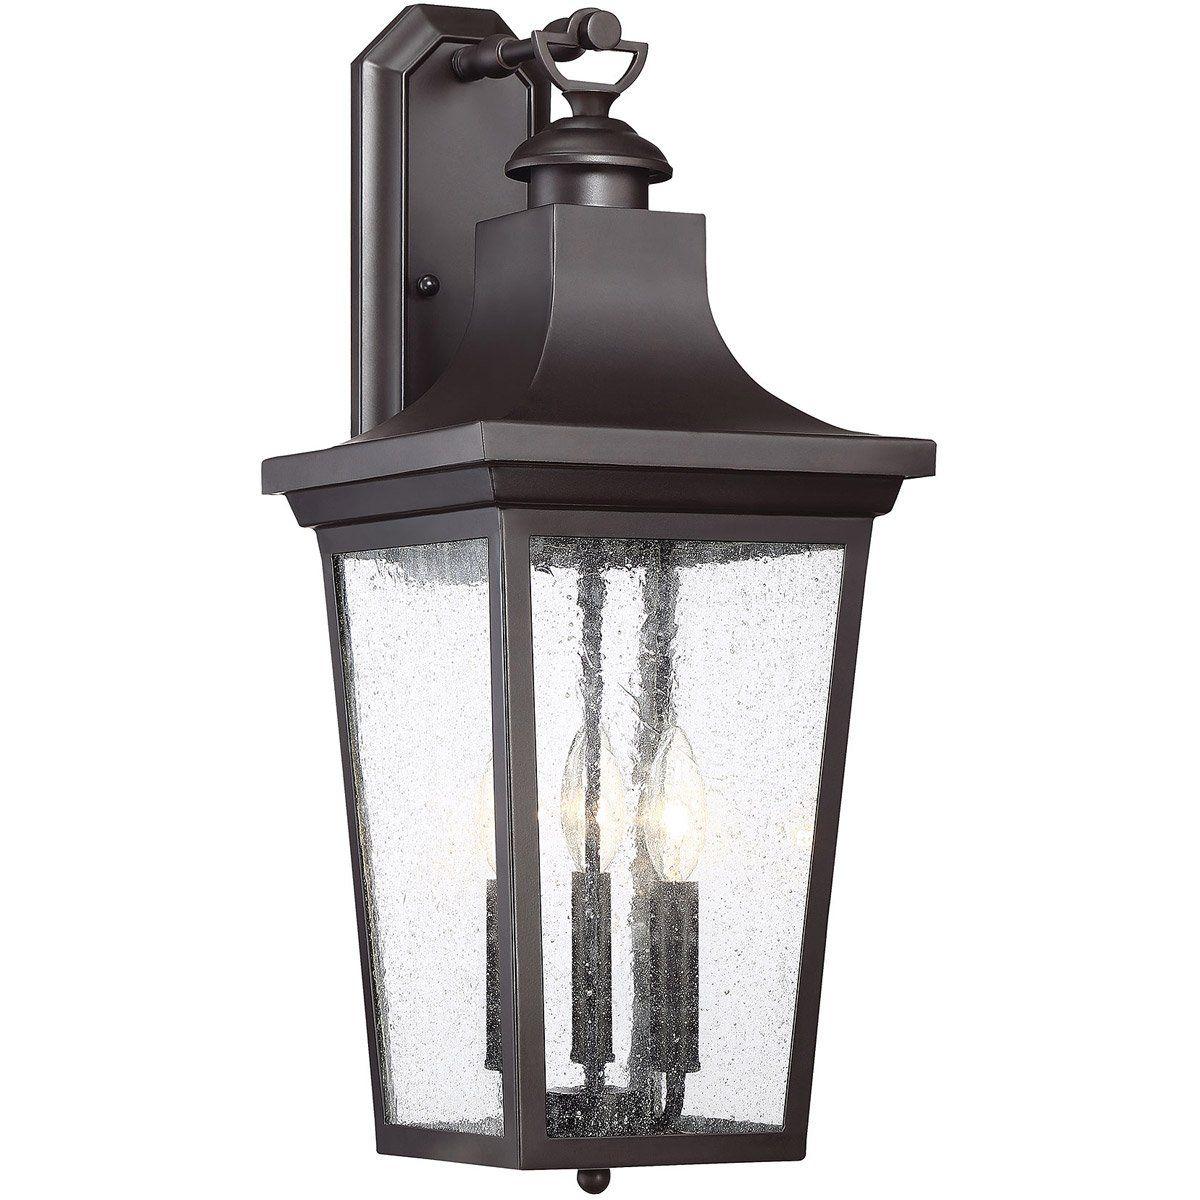 Savoy House Lighting 5 616 13 Randolph 3 Light 23 Inch